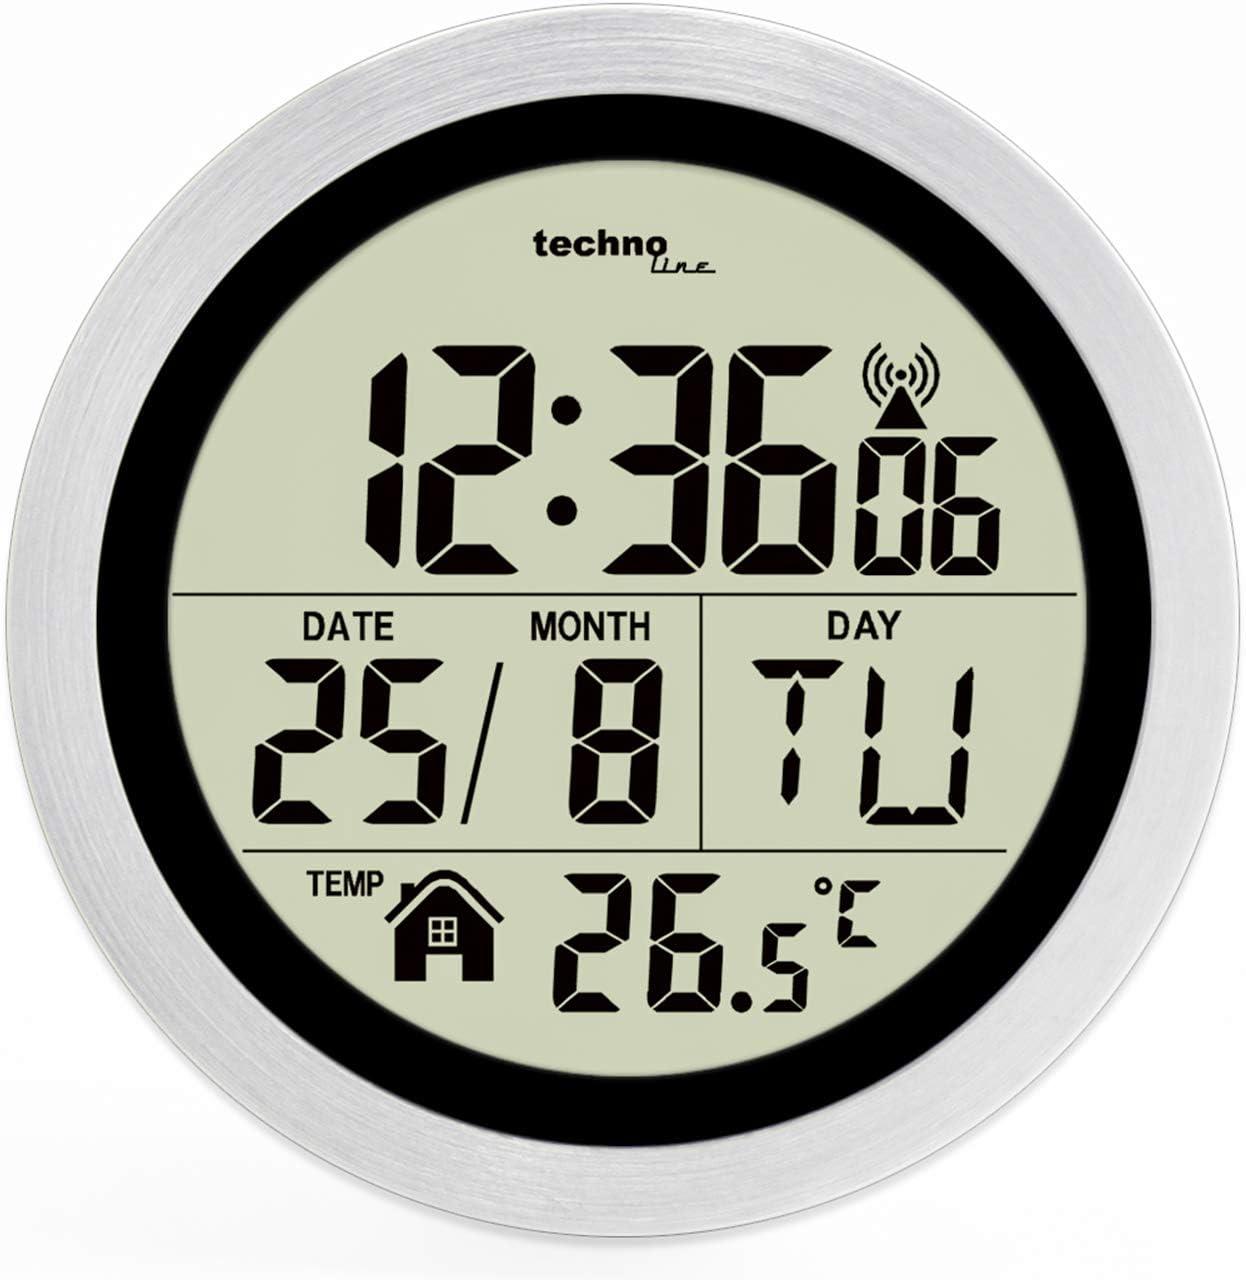 Kuststoff silber Technoline WT3005 Digitale Badezimmer-Funkwanduhr /Ø 147 x 79 mm